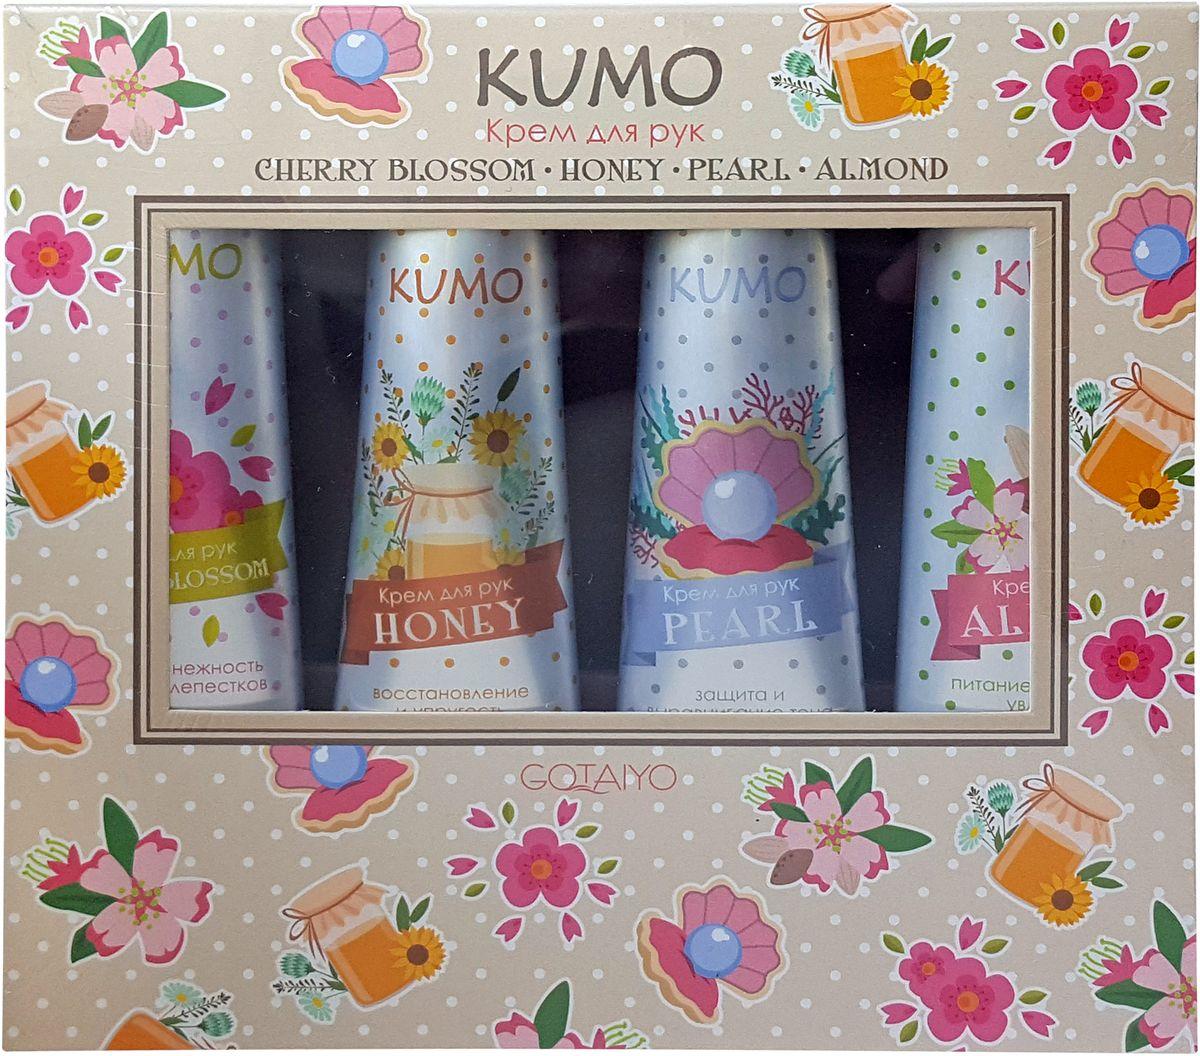 Kumo Набор из 4-х кремов для рук:  Cherry Blossom ,  Honey ,  Pearl ,  Almond , 4 х 30 г - Косметика по уходу за кожей